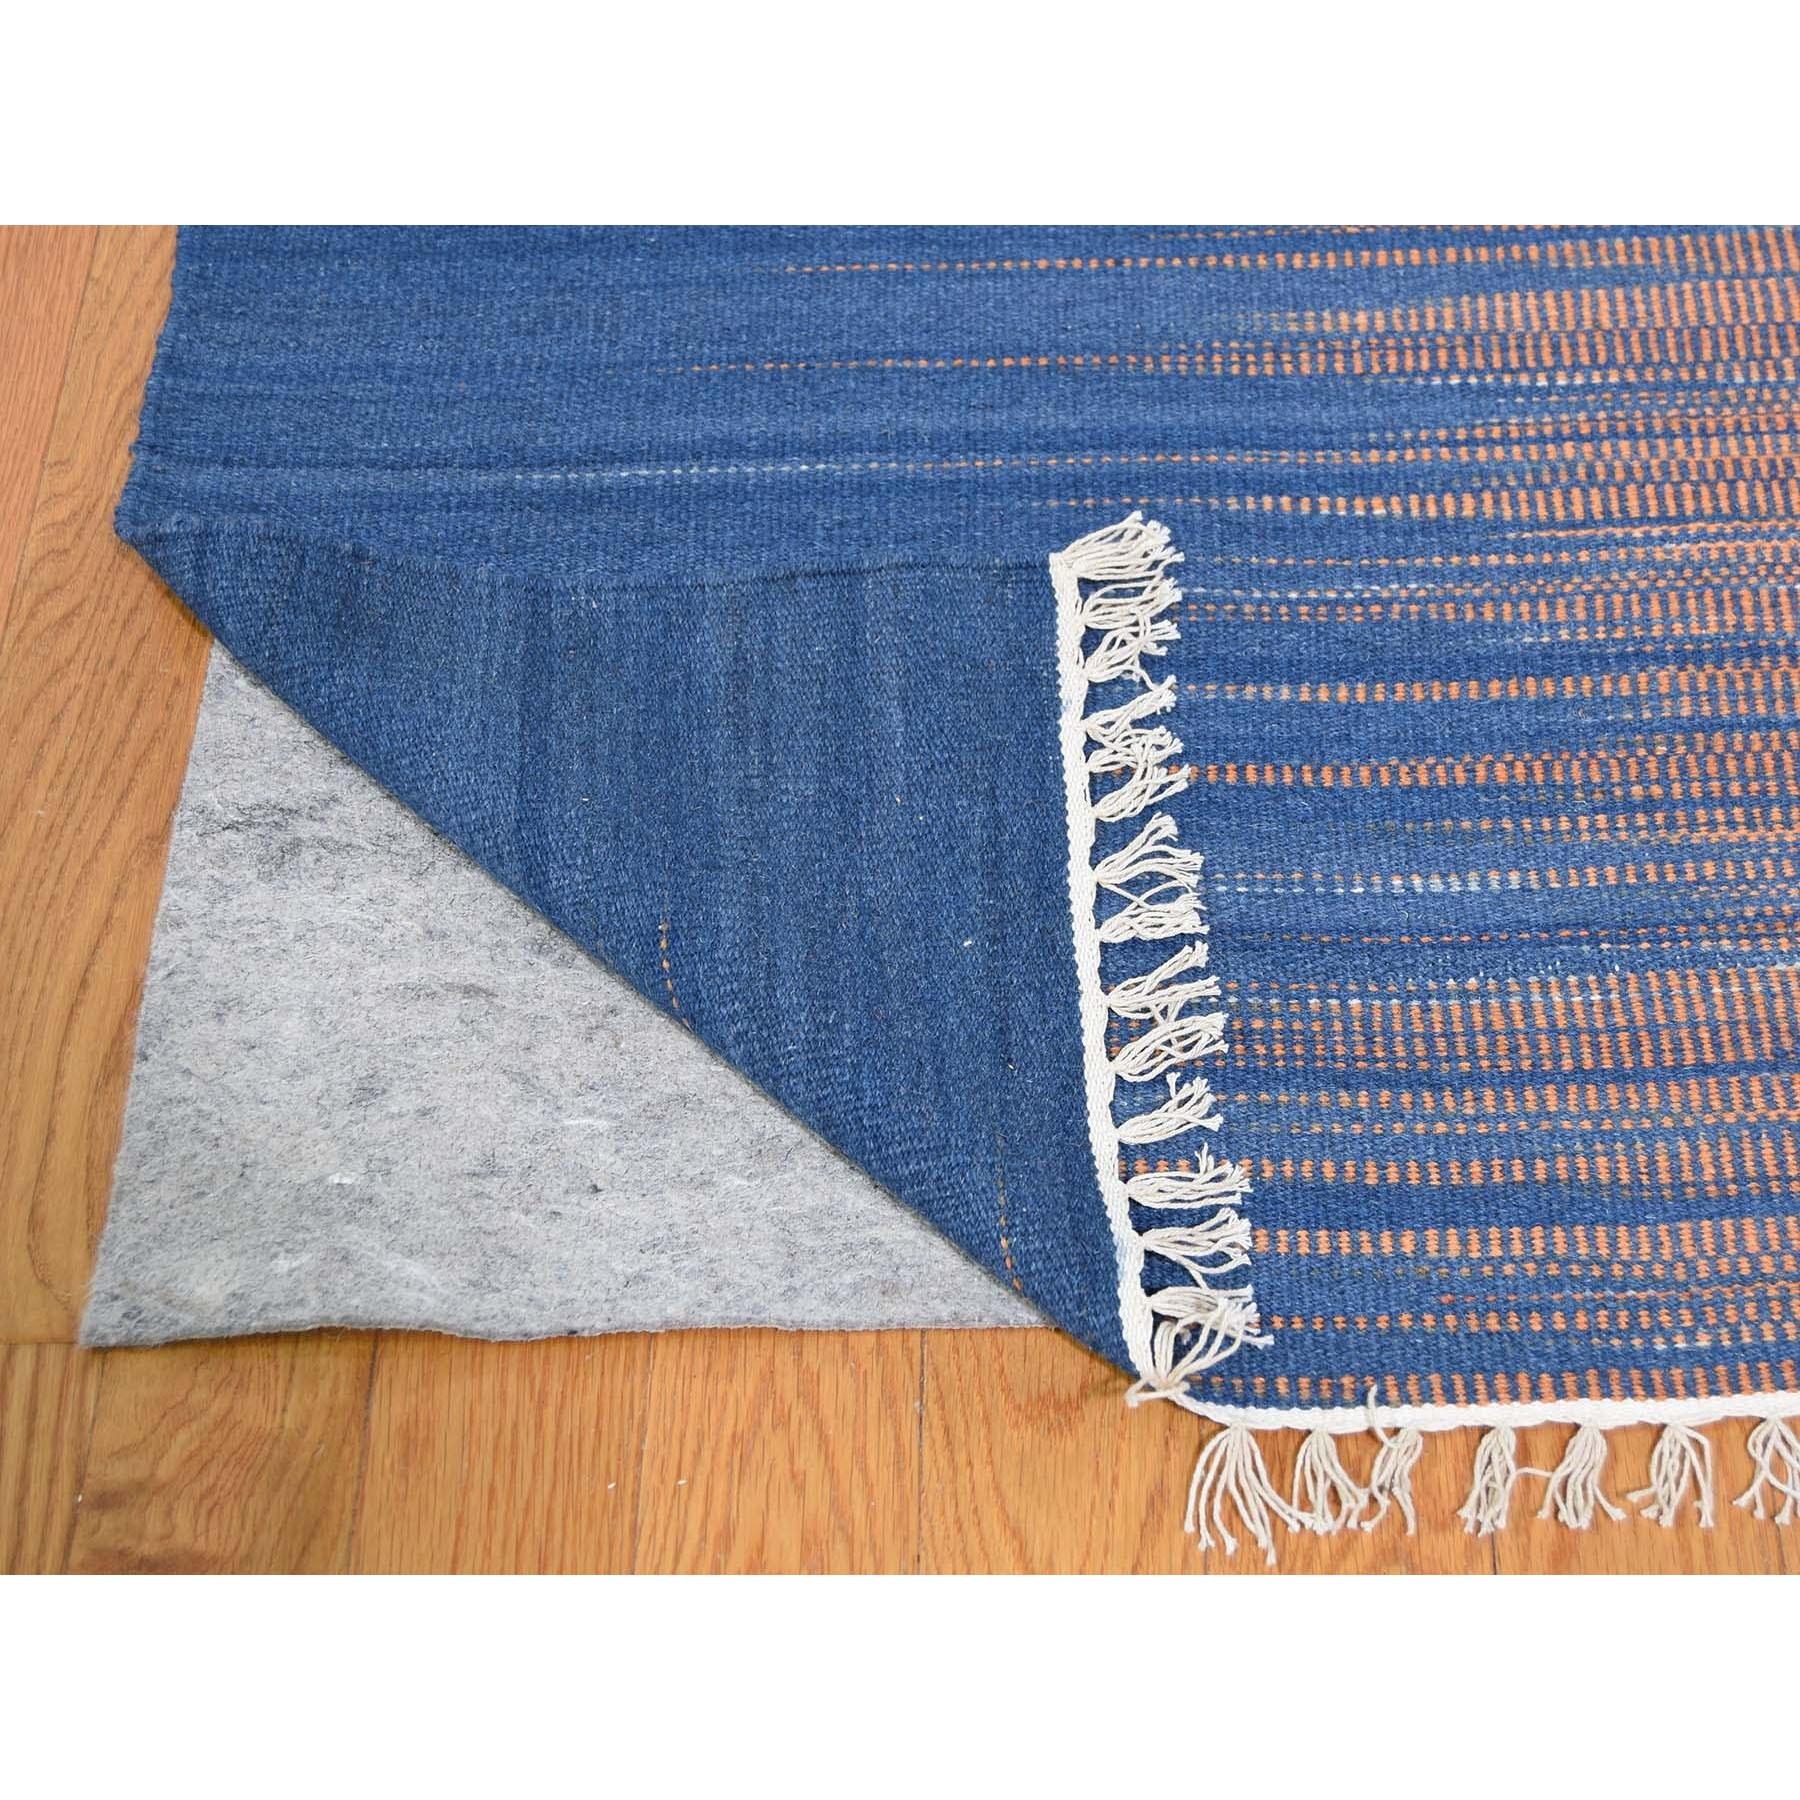 "10'1""x14'5"" Hand Woven Durie Kilim Pure Wool Gradient Design Oriental Rug"